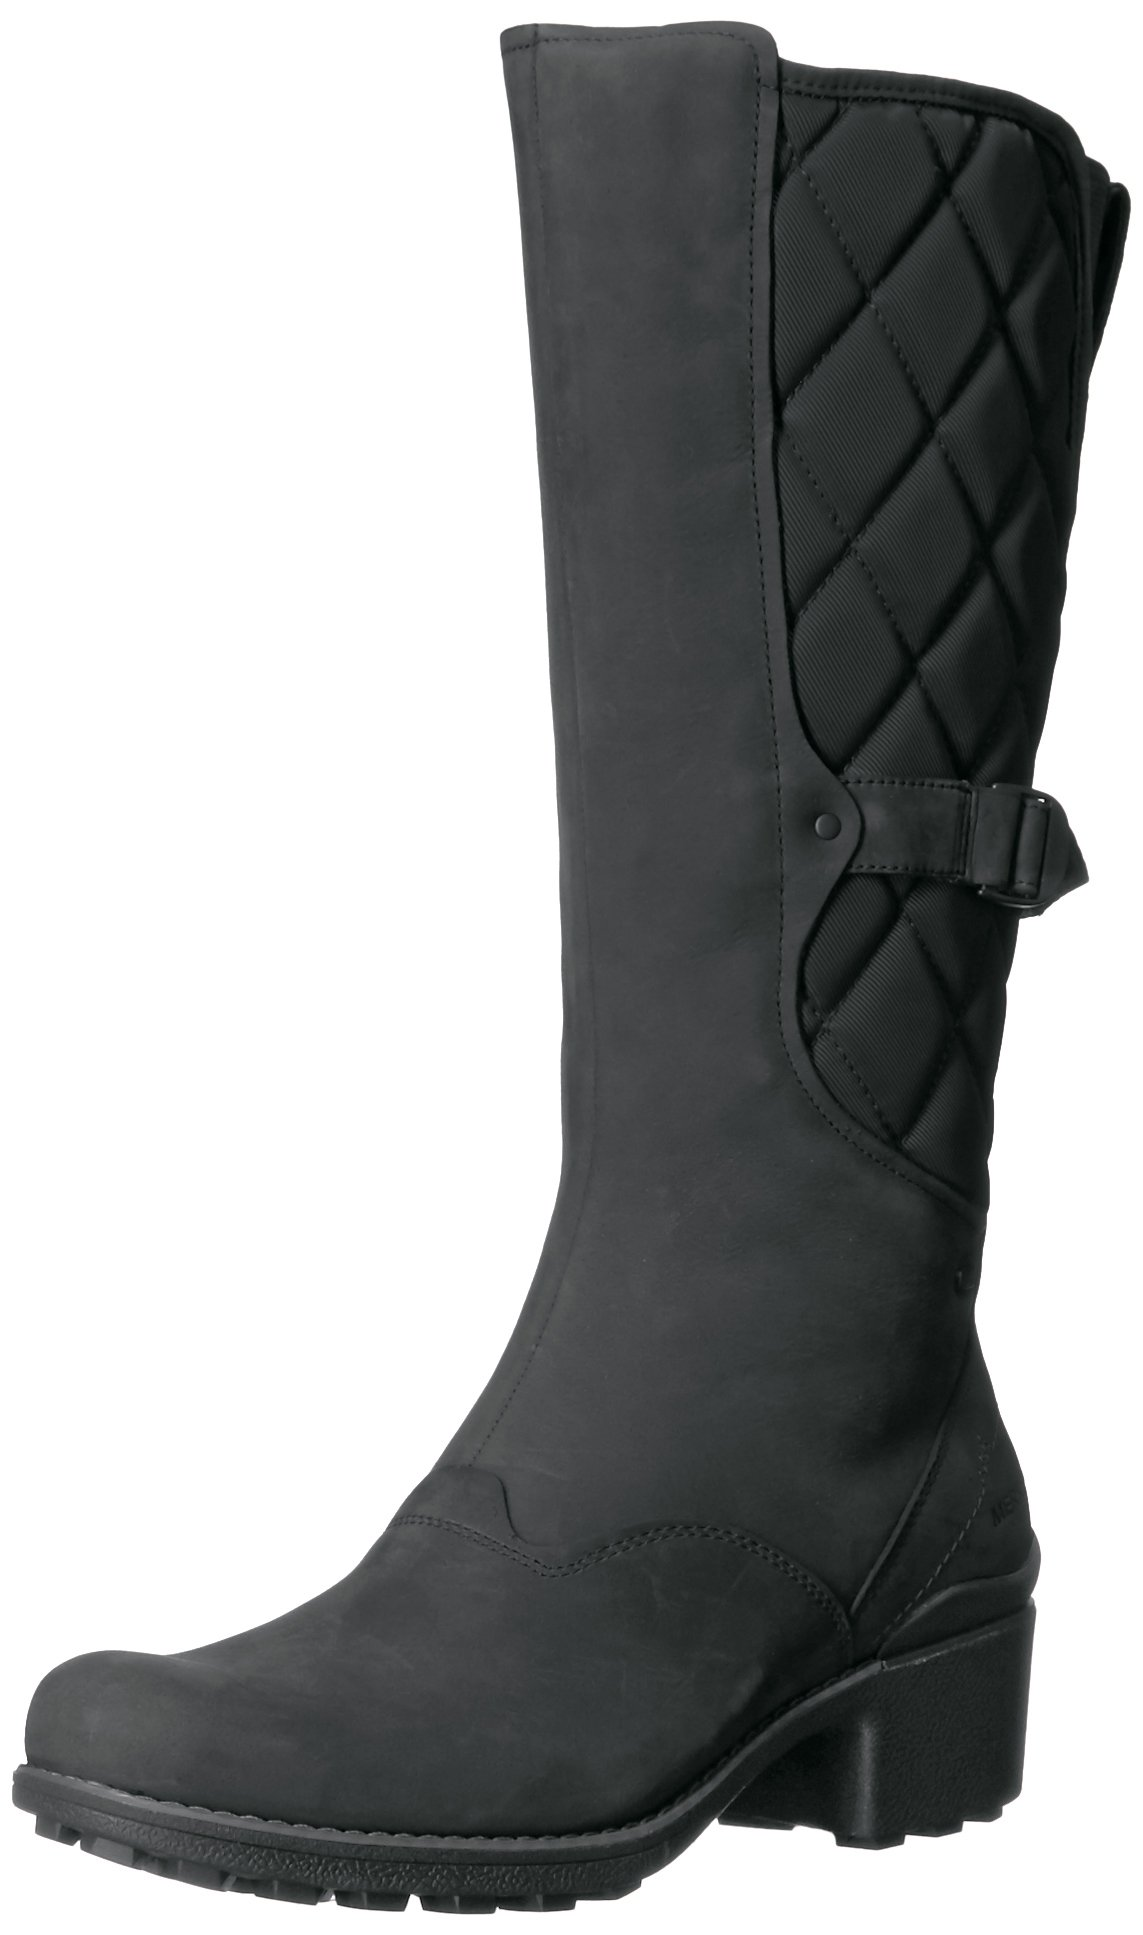 Merrell Women's Chateau Tall Pull Waterproof Snow Boot, Black, 7 M US